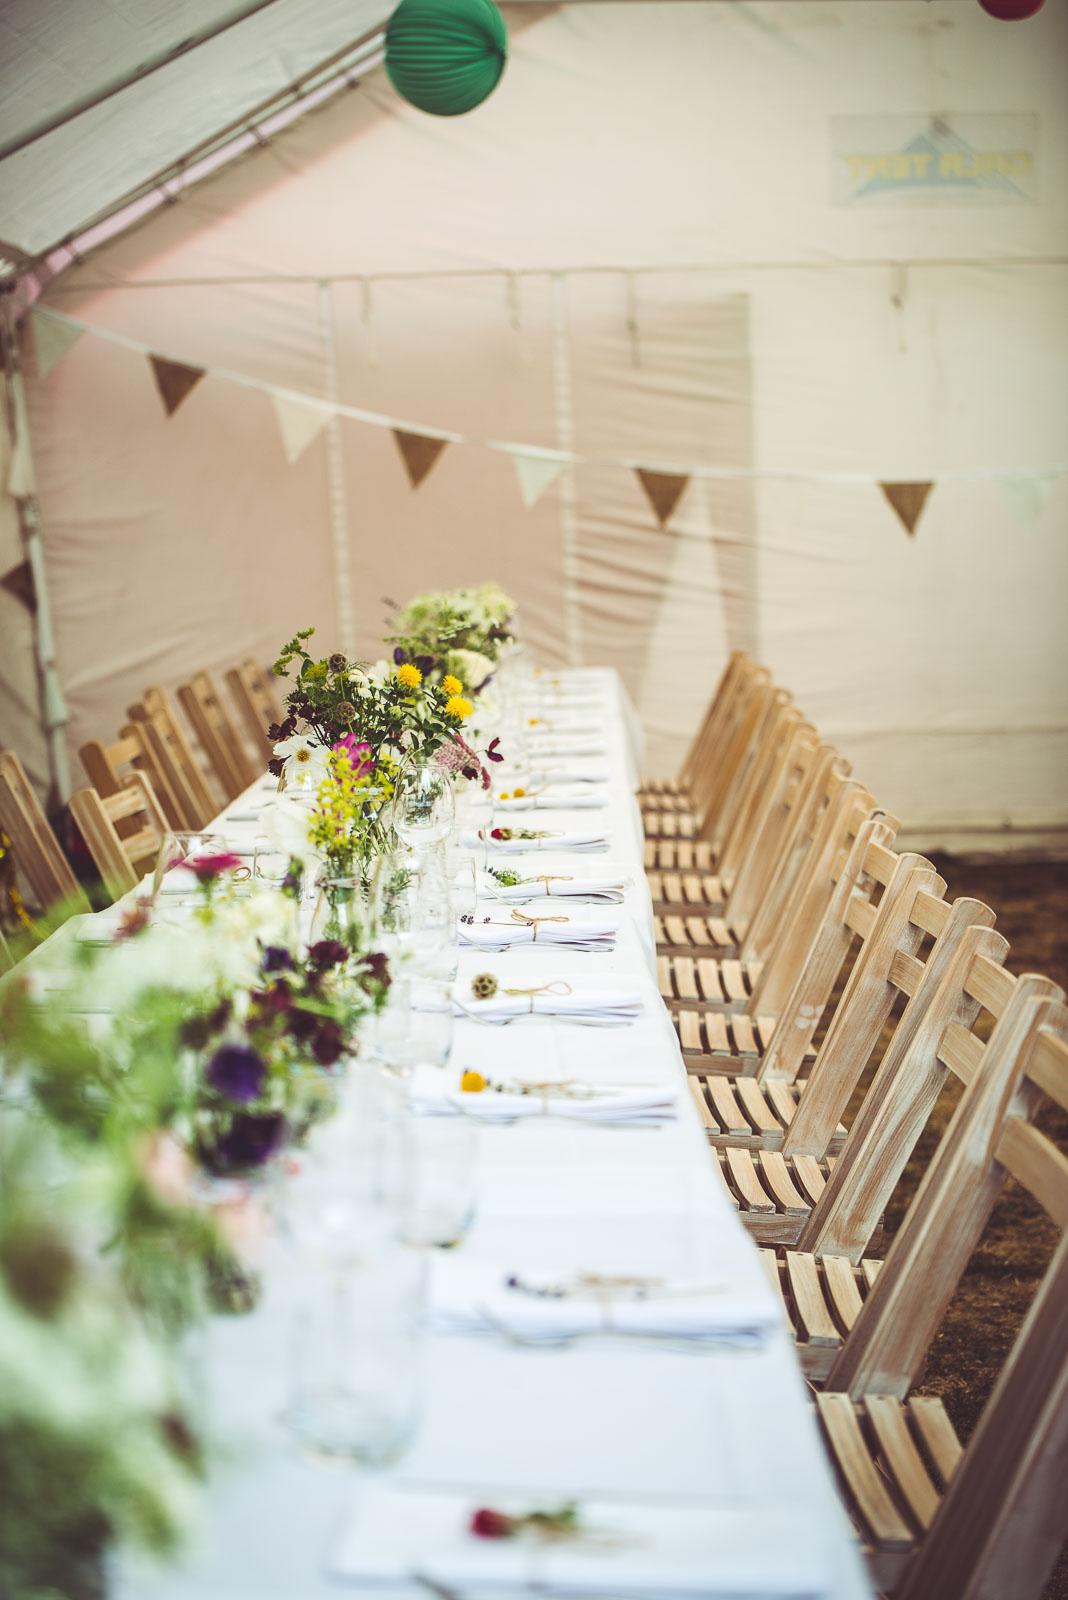 Hitchin_wedding_St_Pauls_Waldenbury_Royston_Wedding_Photographer-45.jpg